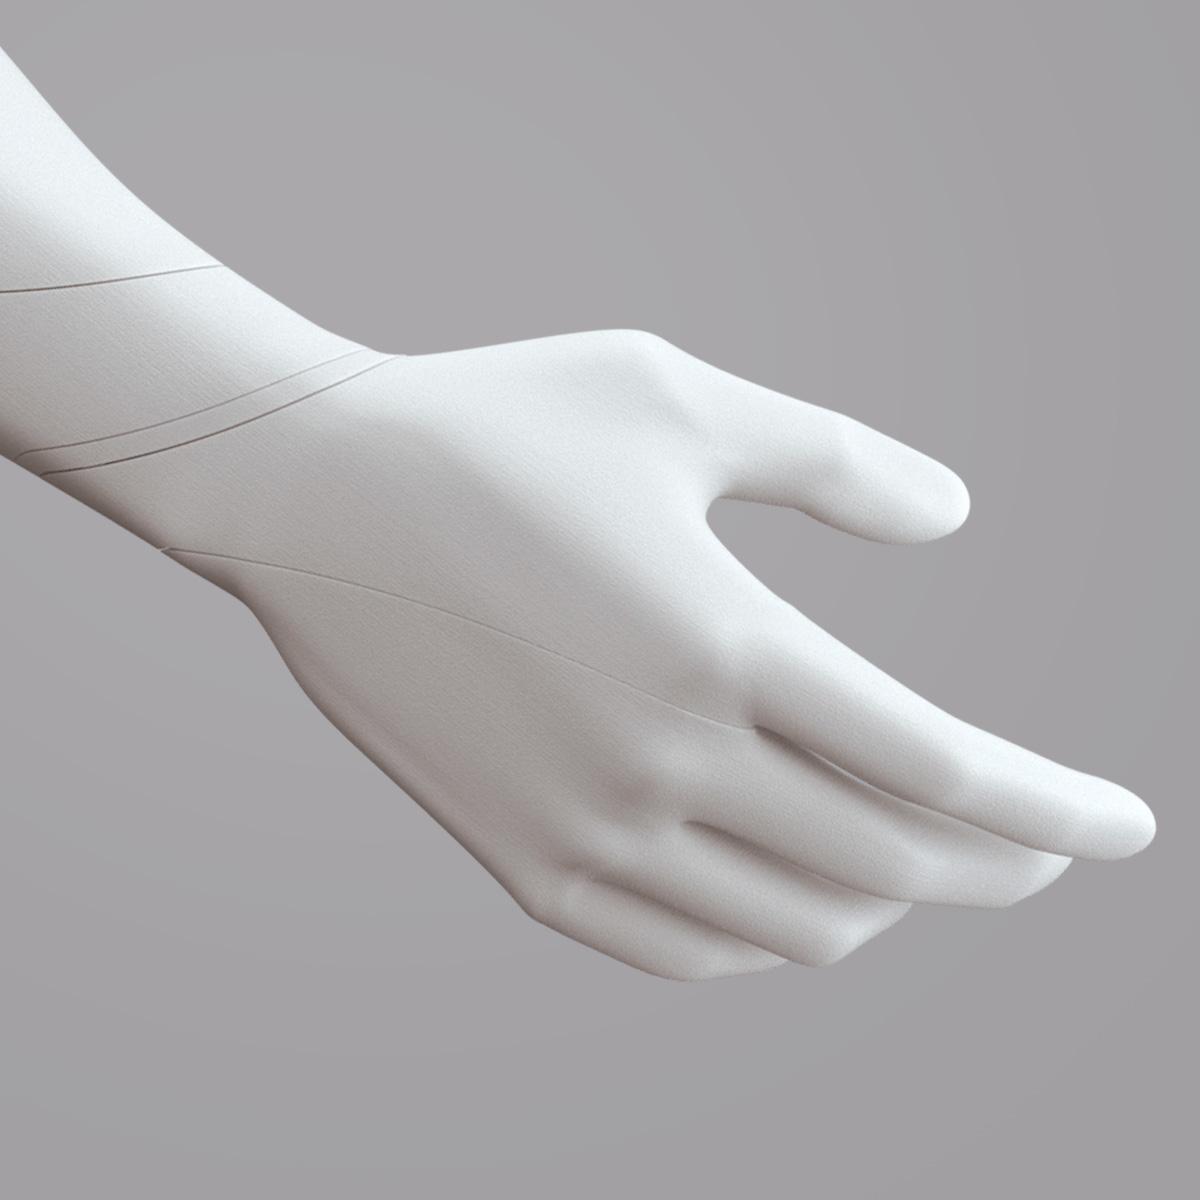 PA11 LOL电竞下注 Printed Prosthetic Hand